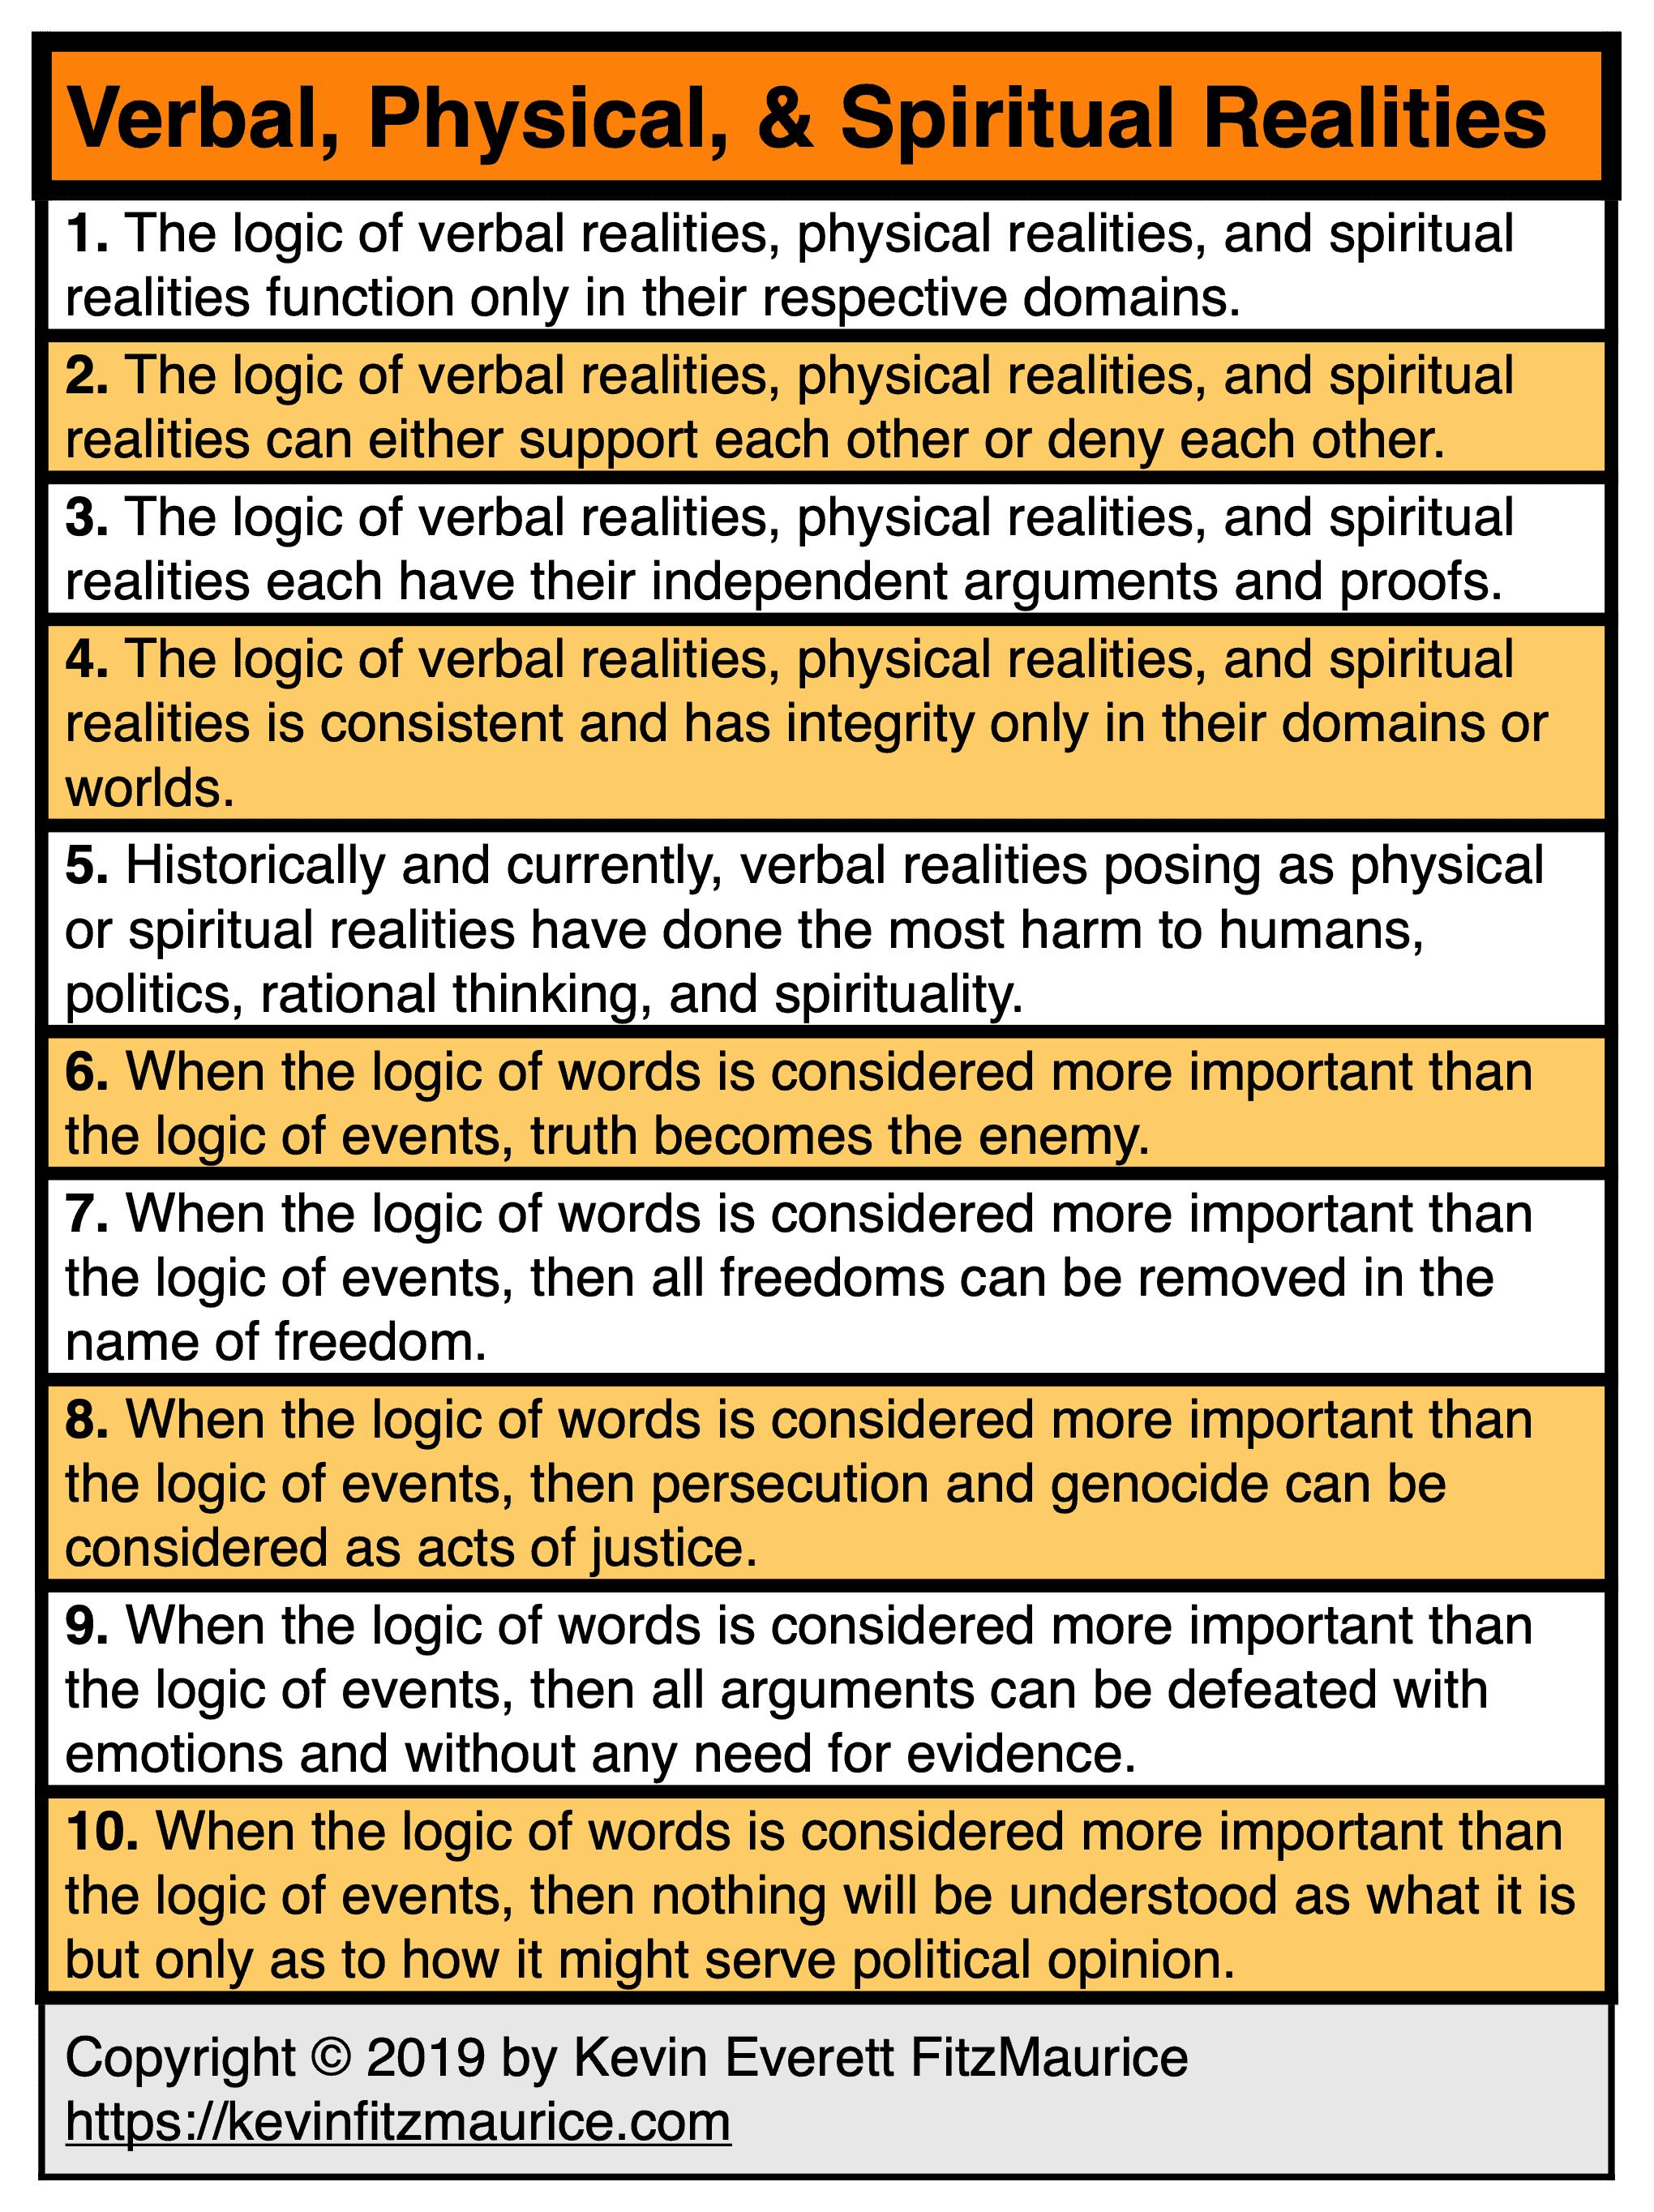 Verbal, Physical, & Spiritual Realities